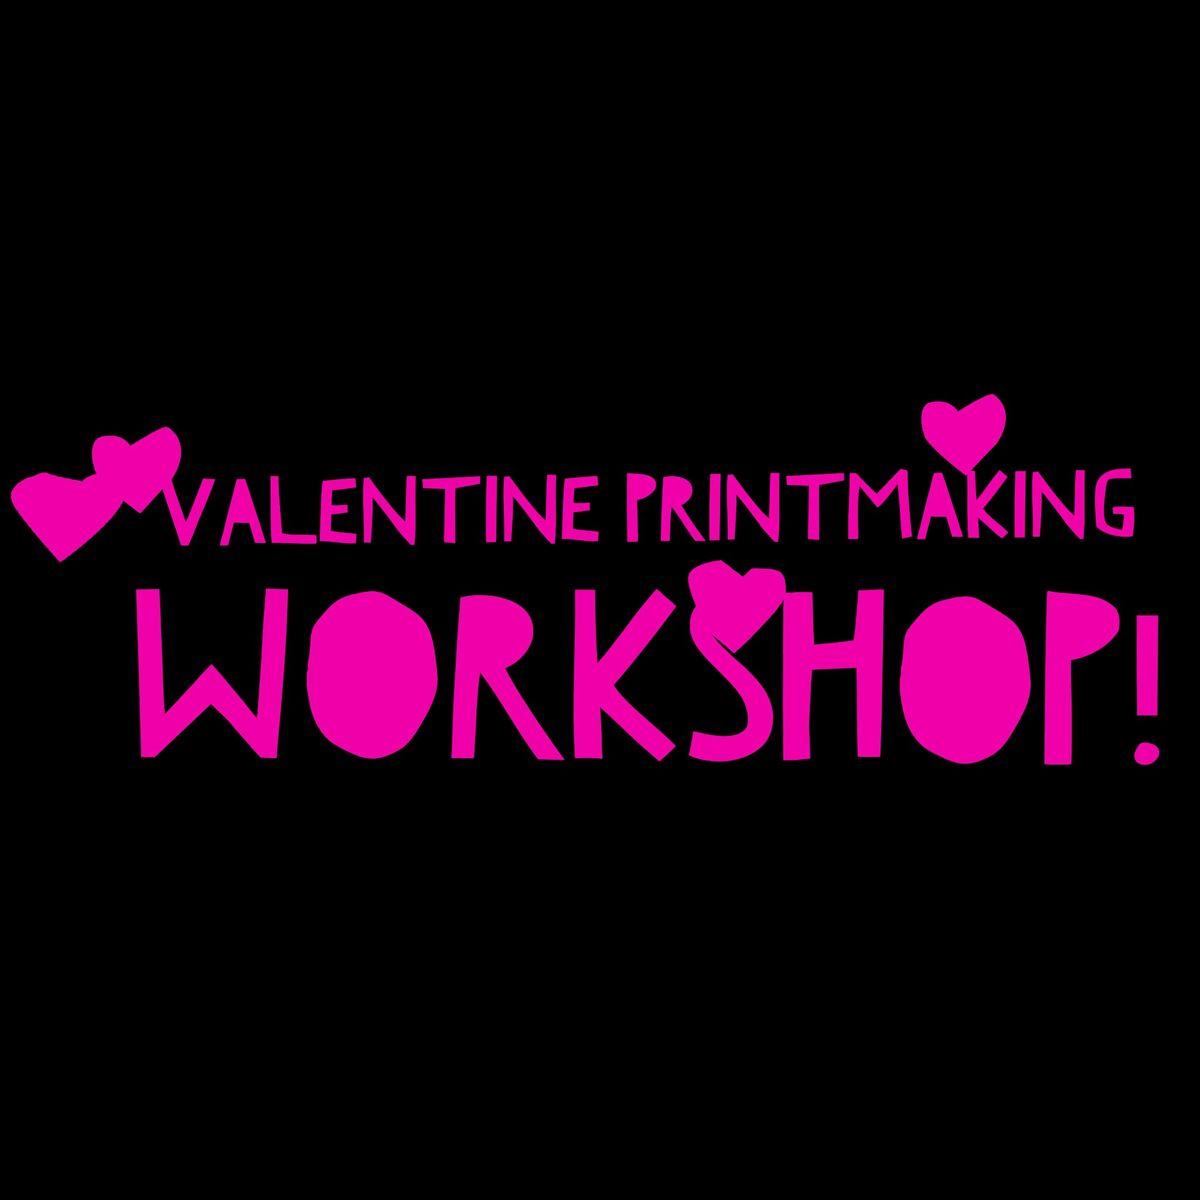 Valentine Printmaking Workshop for Toddlers